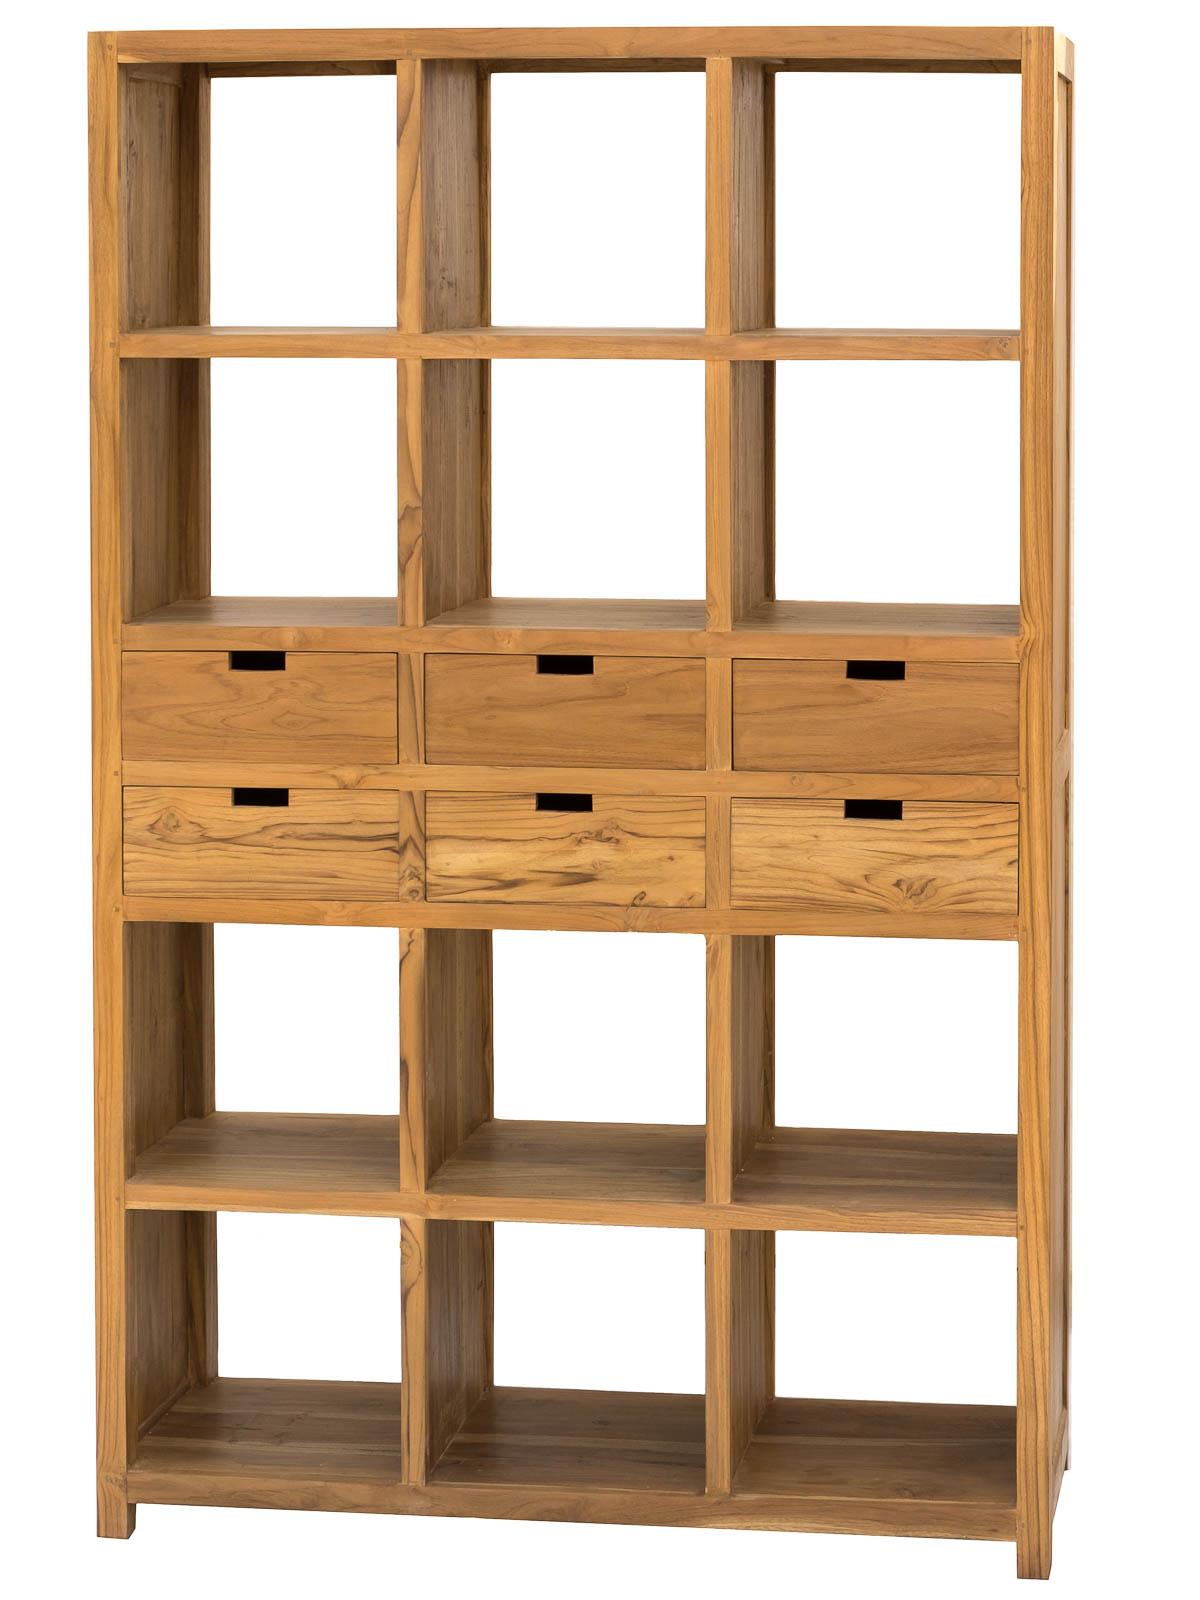 biblioth que 6 tiroirs la case d co. Black Bedroom Furniture Sets. Home Design Ideas